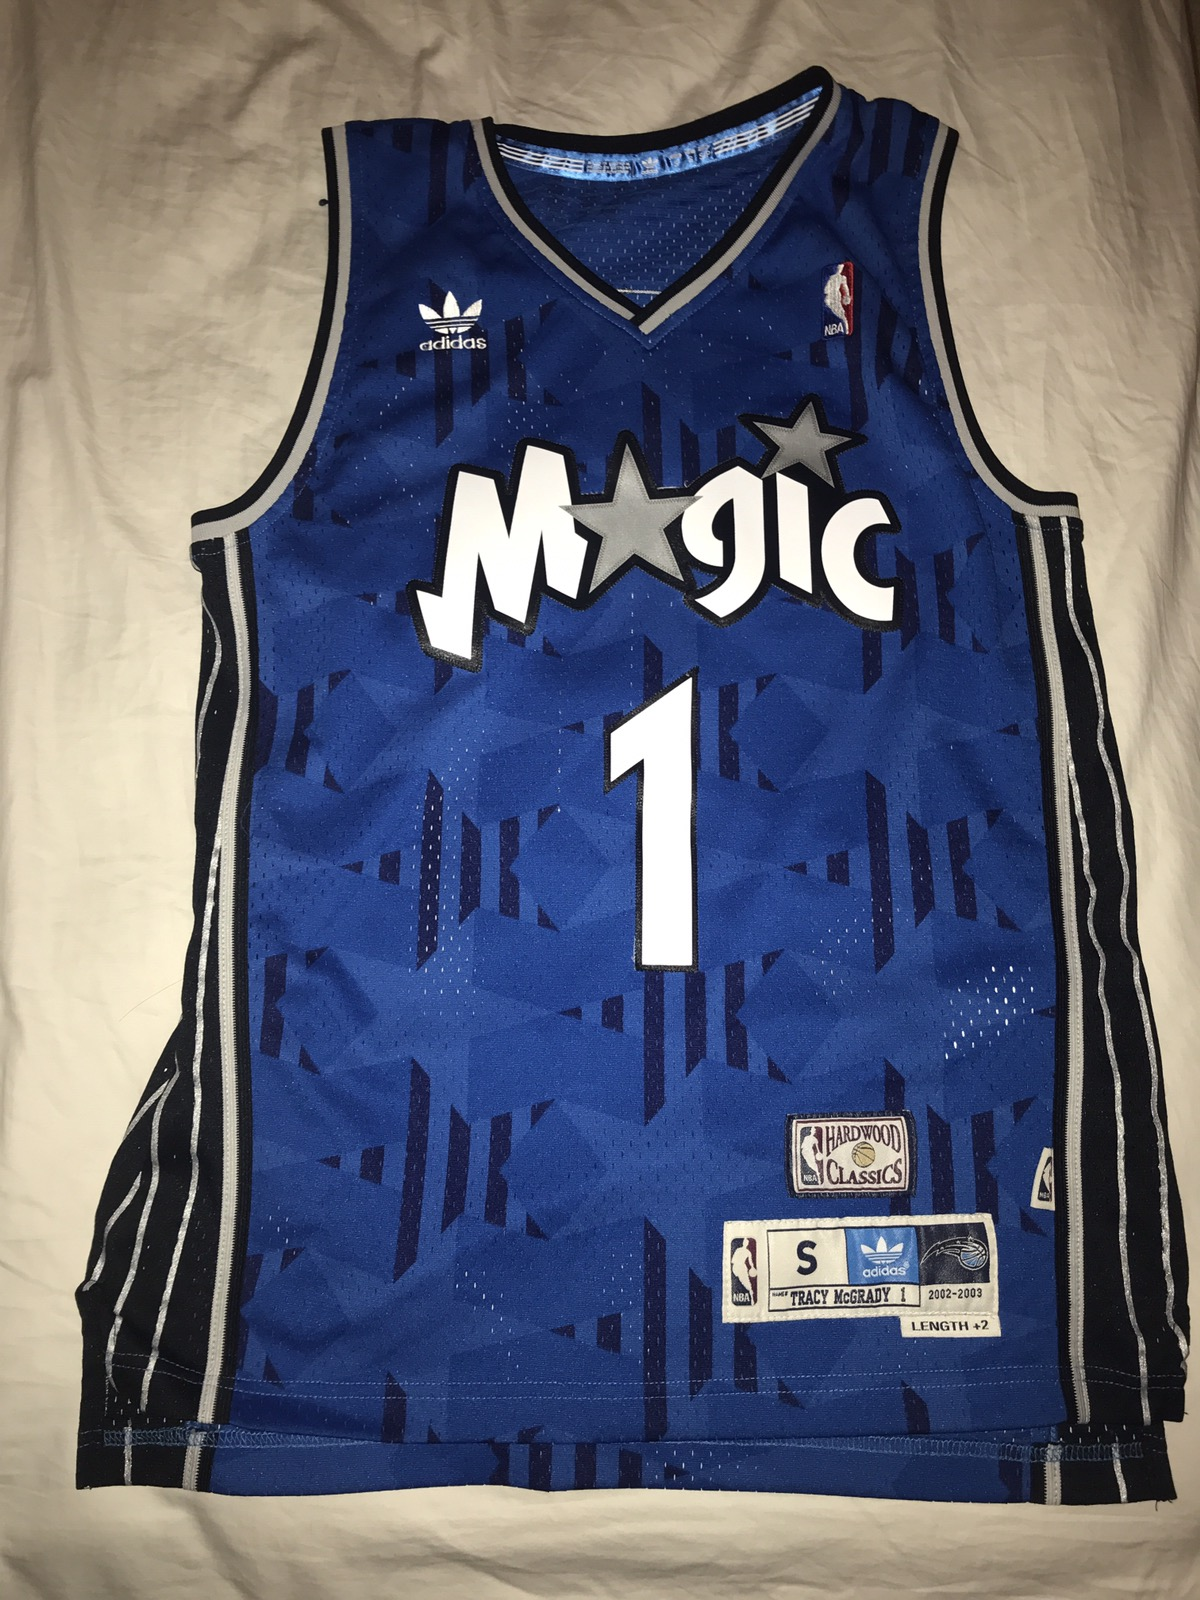 Adidas × Nba. Orlando Magic Tracy McGrady 02-03 NBA Jersey. Size  US S ... 8274fb610